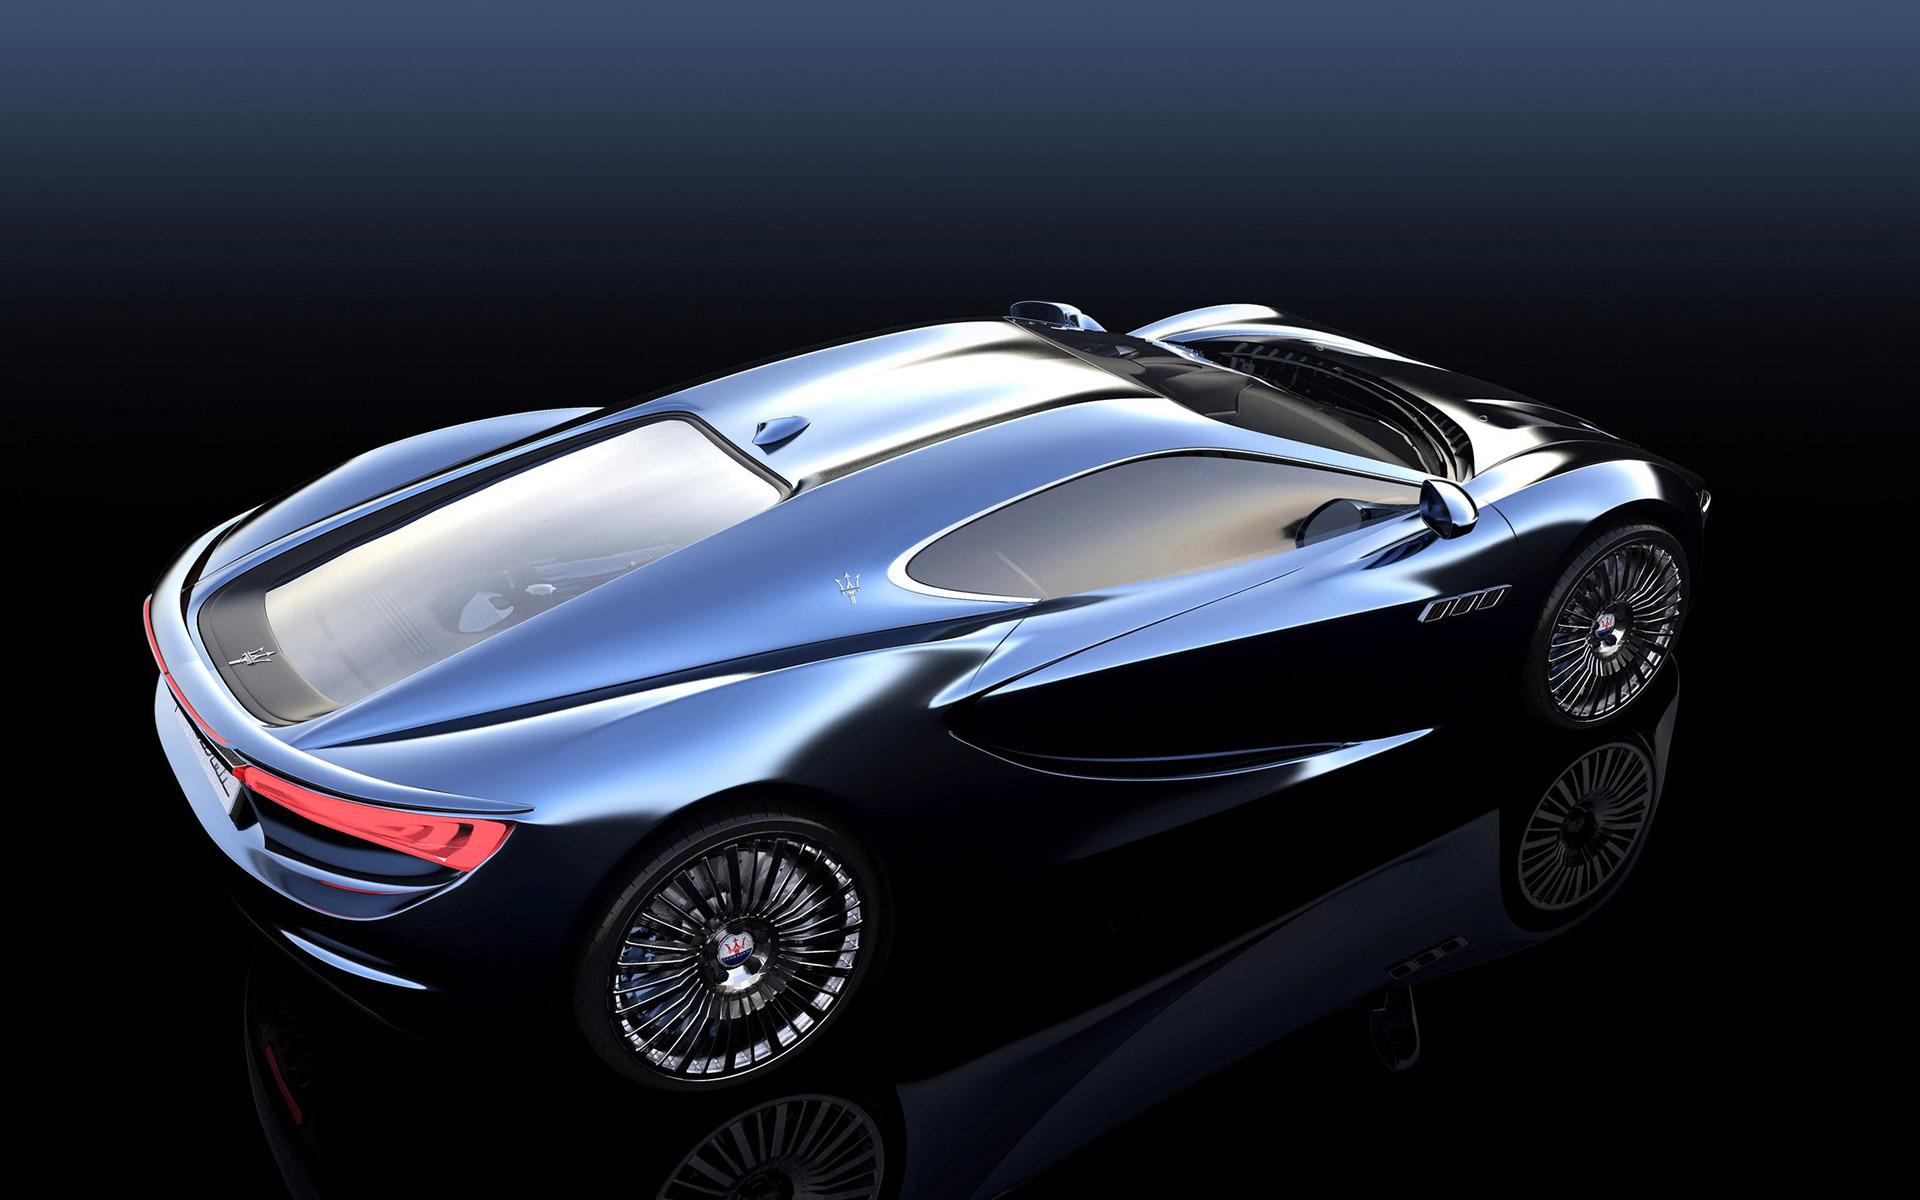 Maserati Bora Concept by Alexander Imnadze - Car Body Design